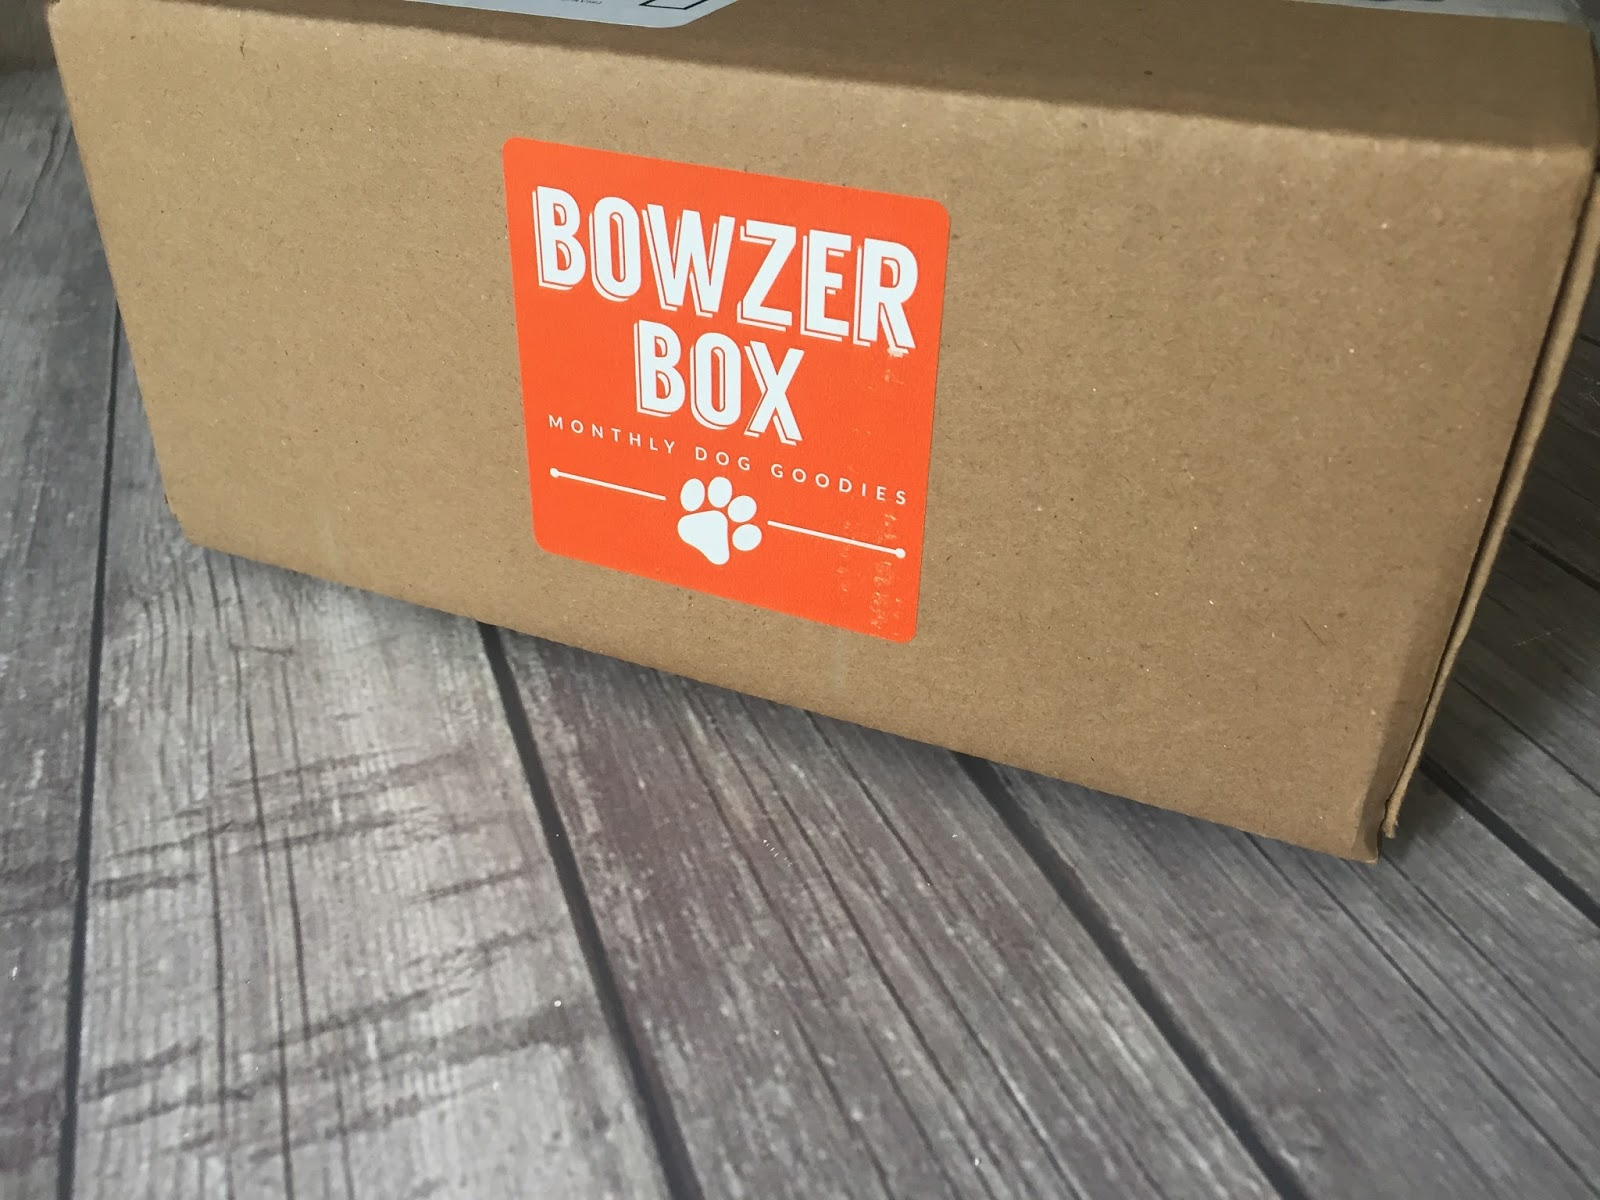 Bowzer Box Review May 2016 Canadian Pet Subscription Box Promo